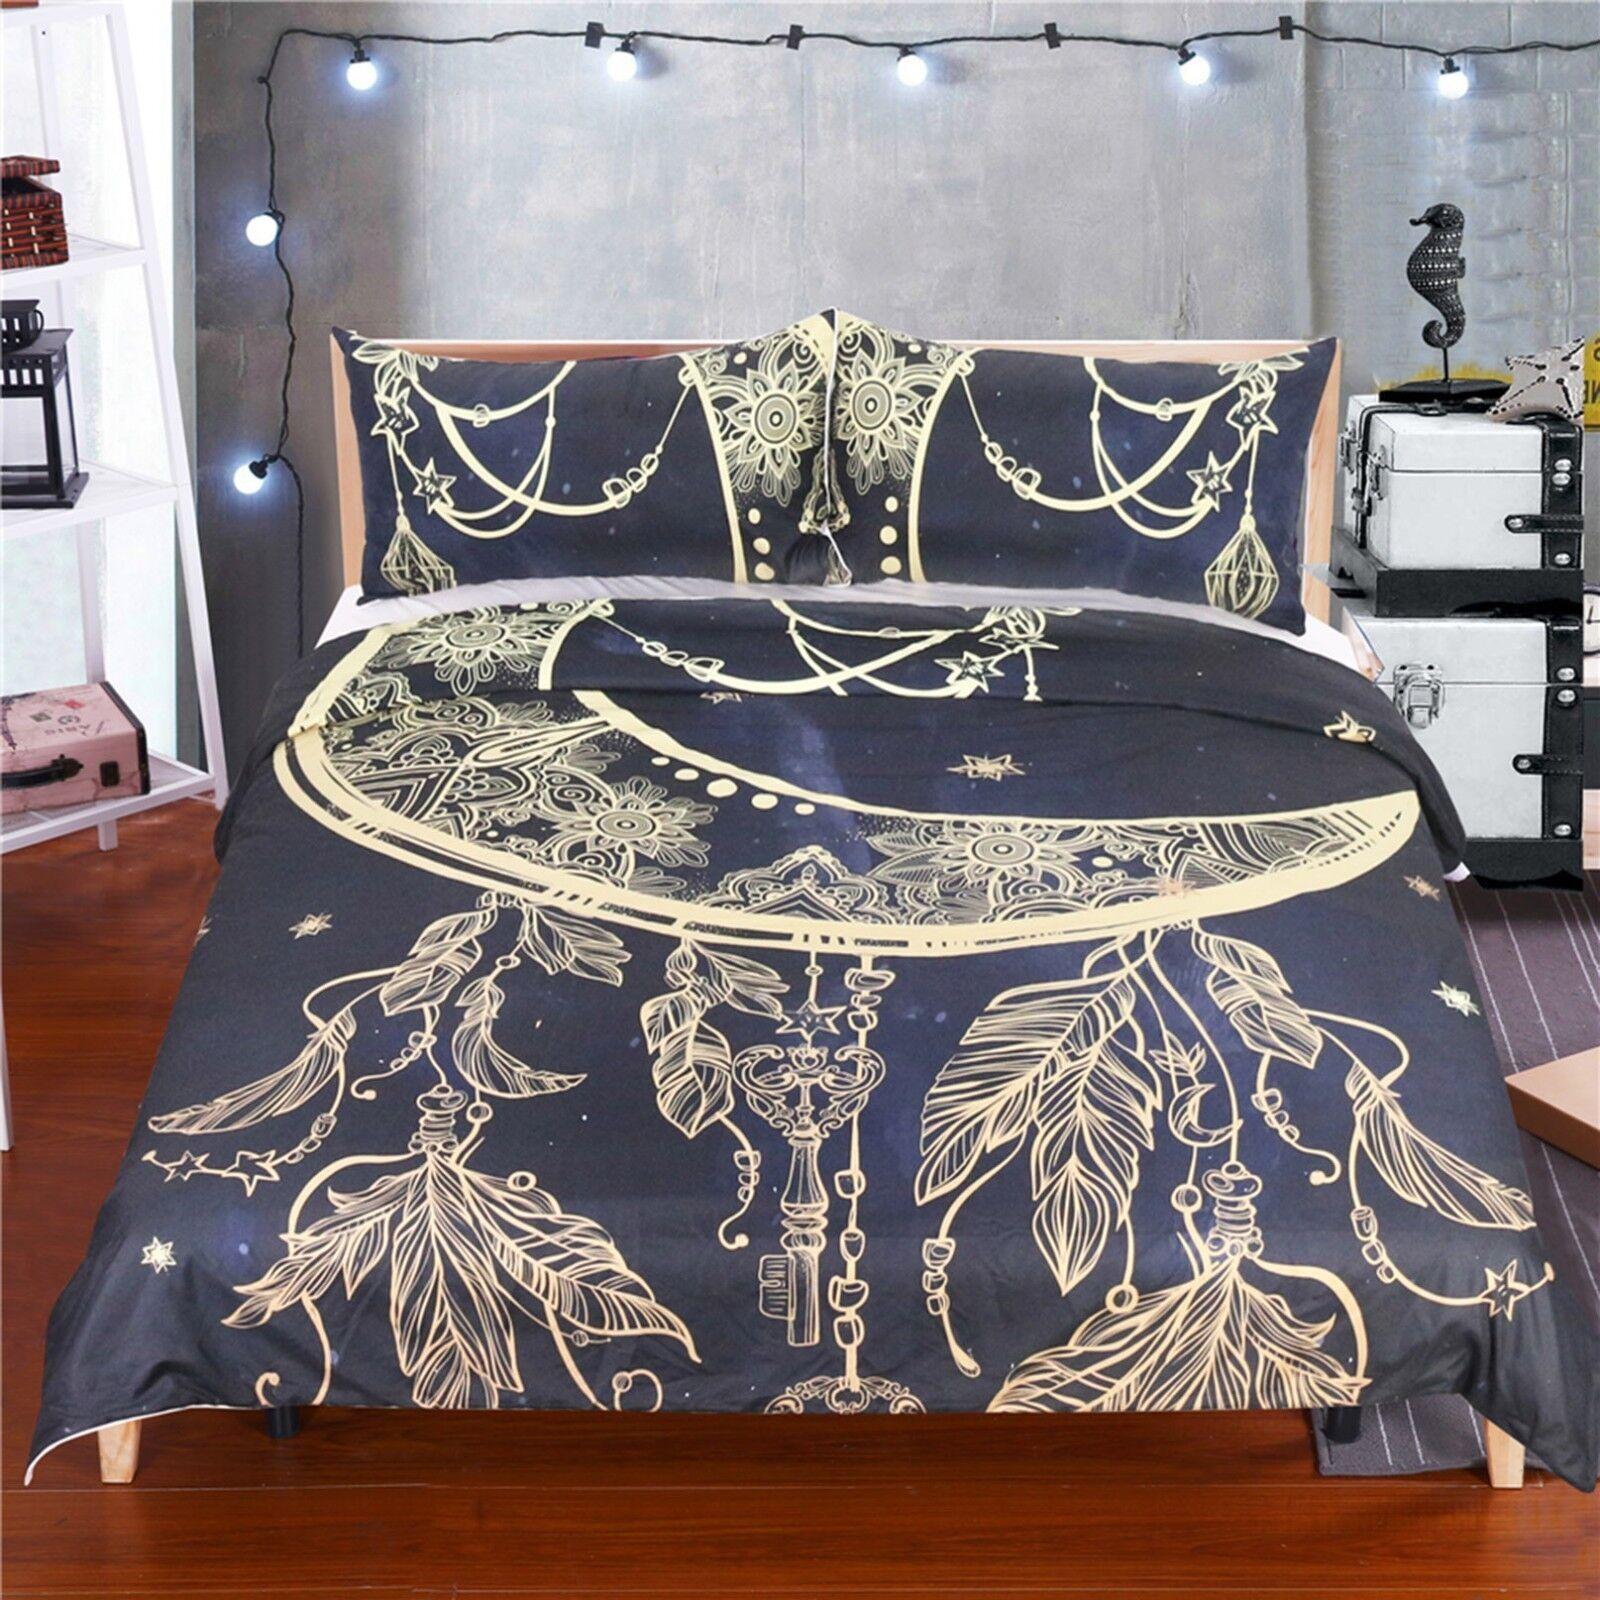 3D Moon Feather 572 Bed Pillowcases Quilt Duvet Cover Set Single Queen King AU